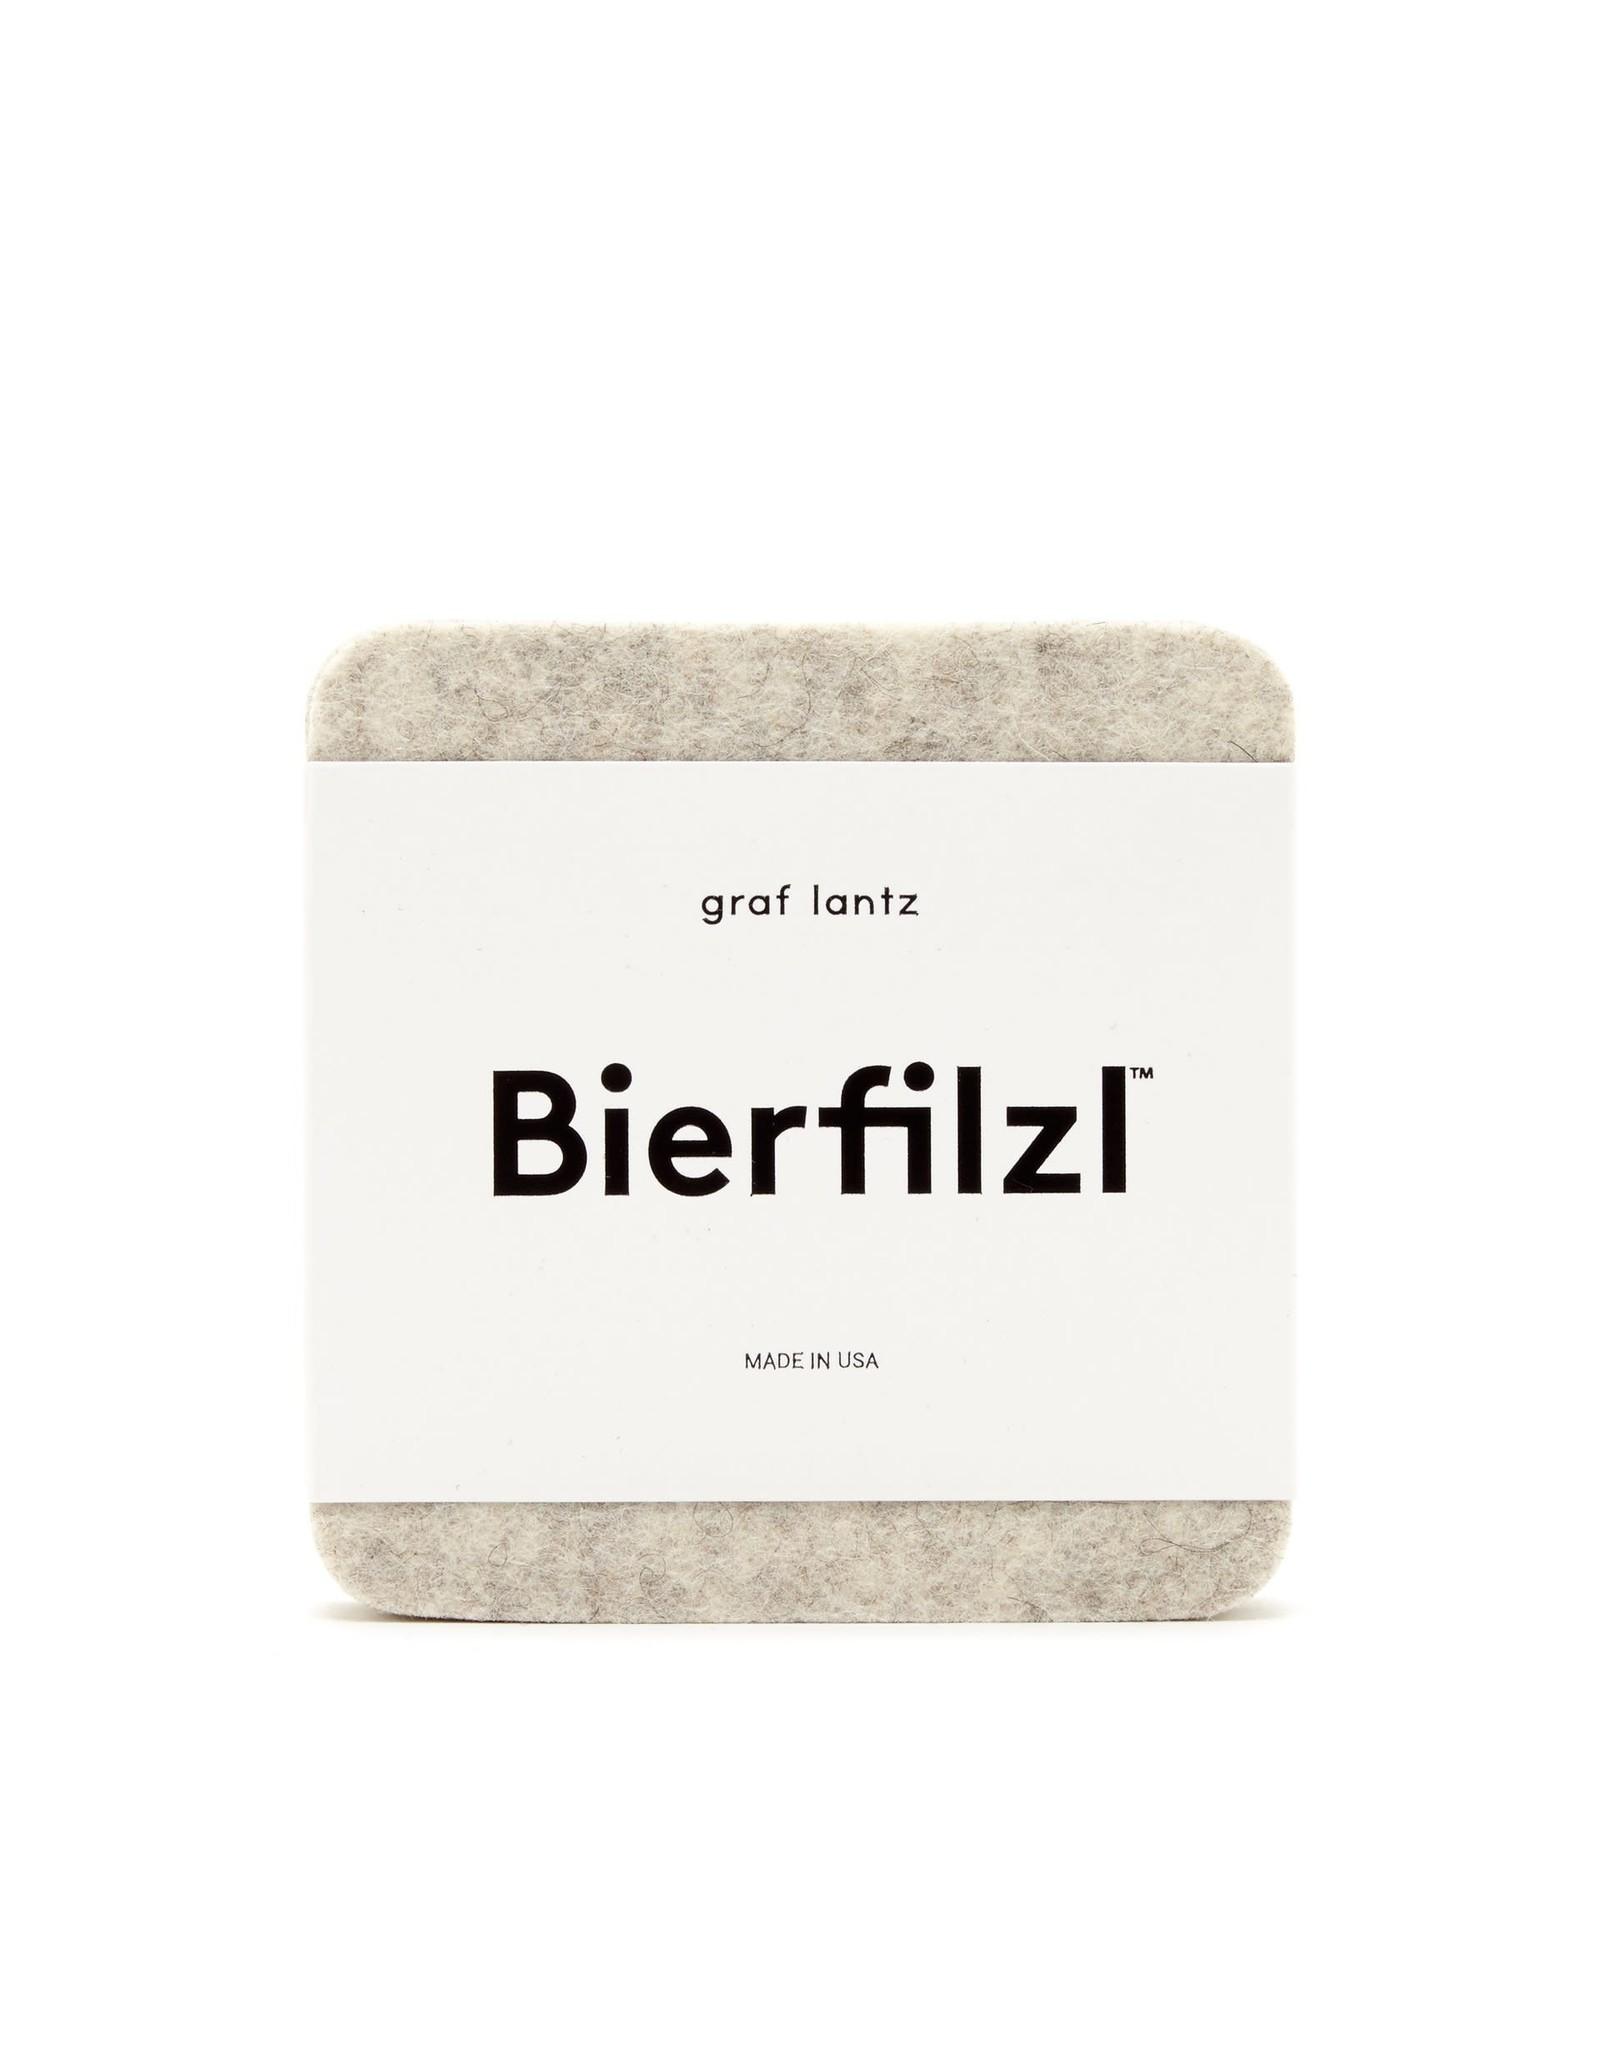 Bierfilzl Square Multi Color Felt Coaster in Midcentury